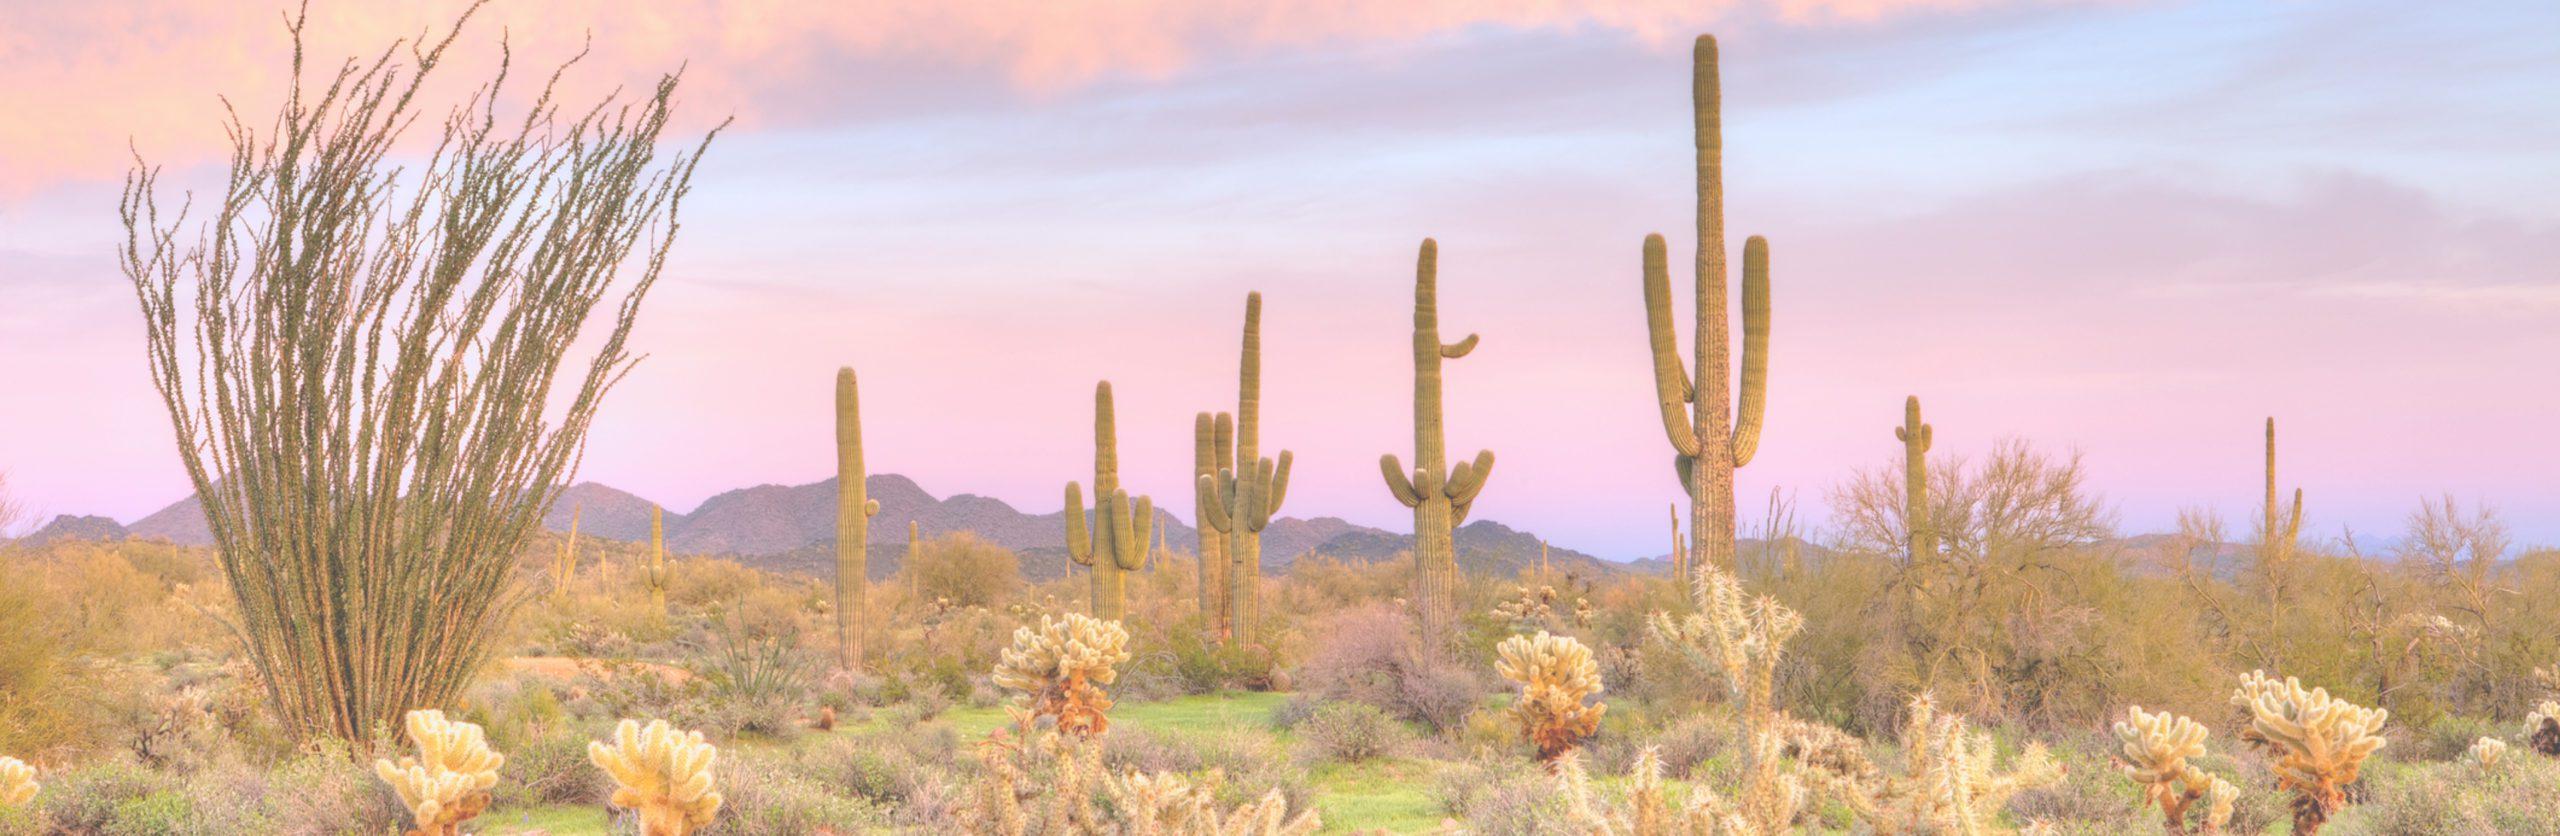 Arizona Home Testimonials